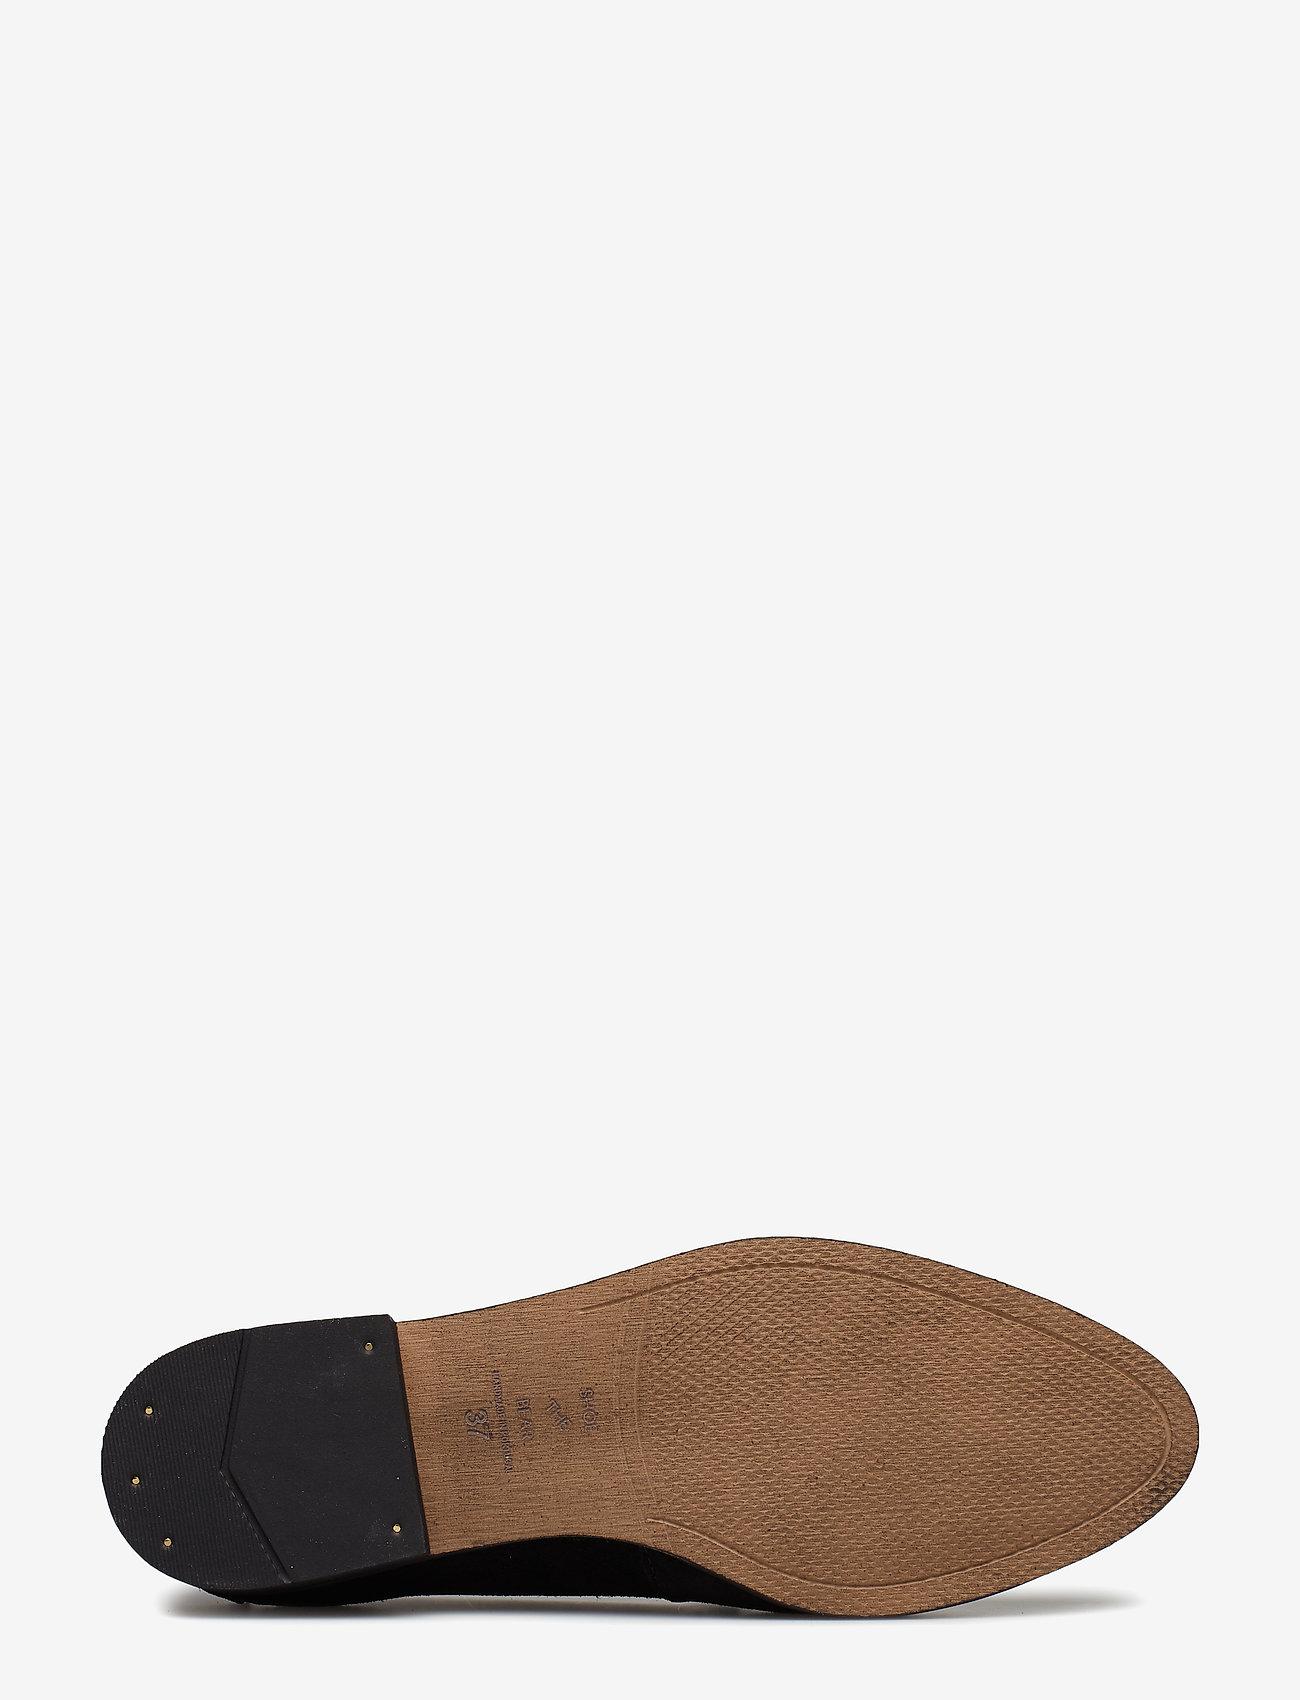 Shoe The Bear JUNO STONE - Flache Schuhe BLACK - Schuhe Billige